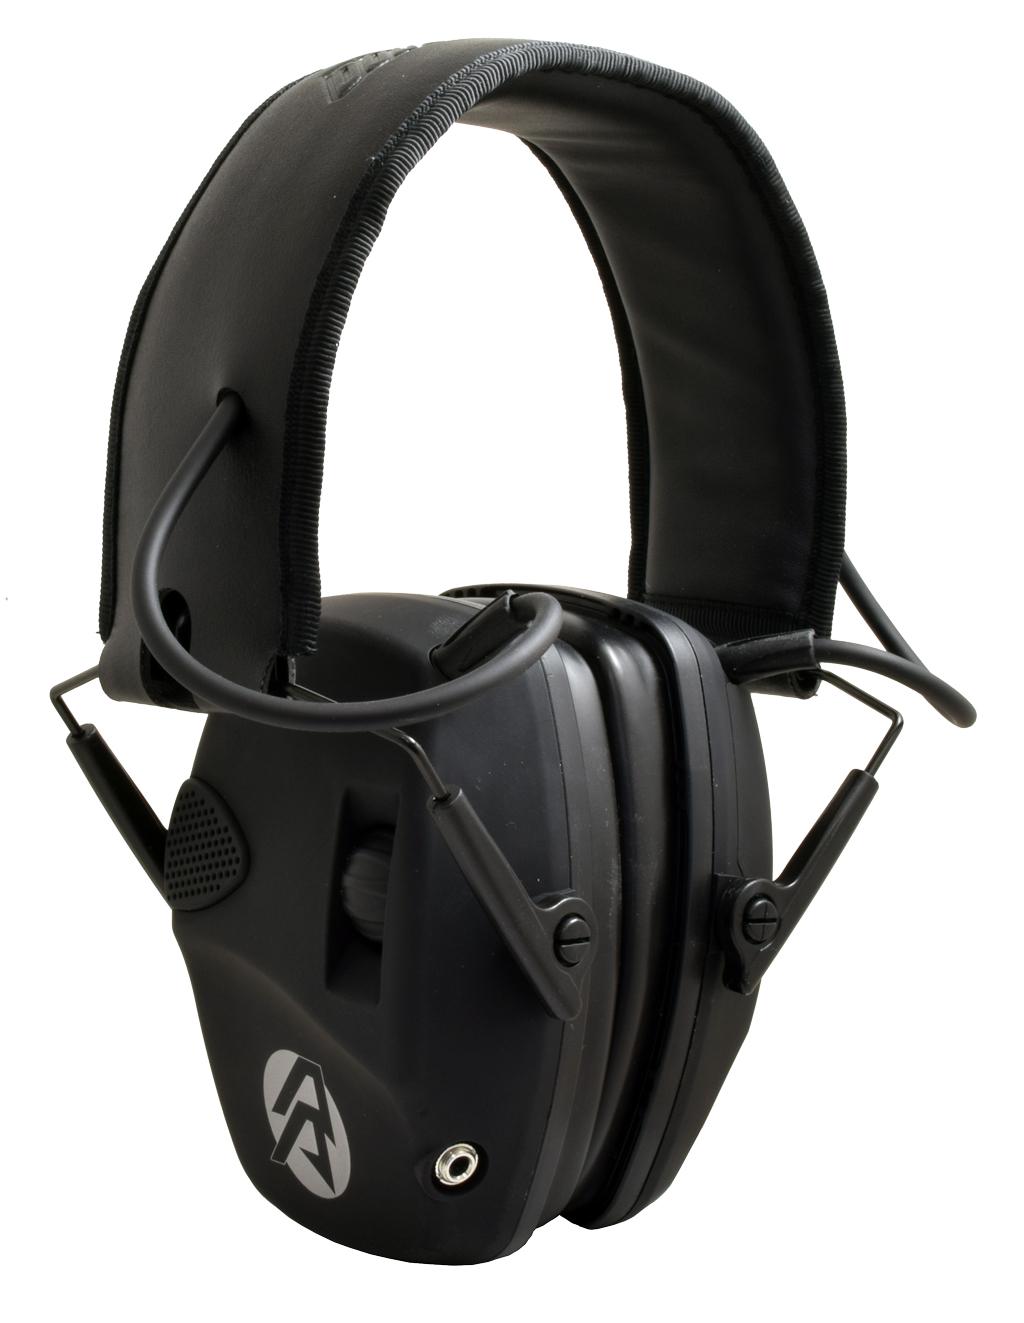 DAA Electronic Hearing Protection EHP27 - Ear muffs - Shooter equipment - 3gun.pl store - steel